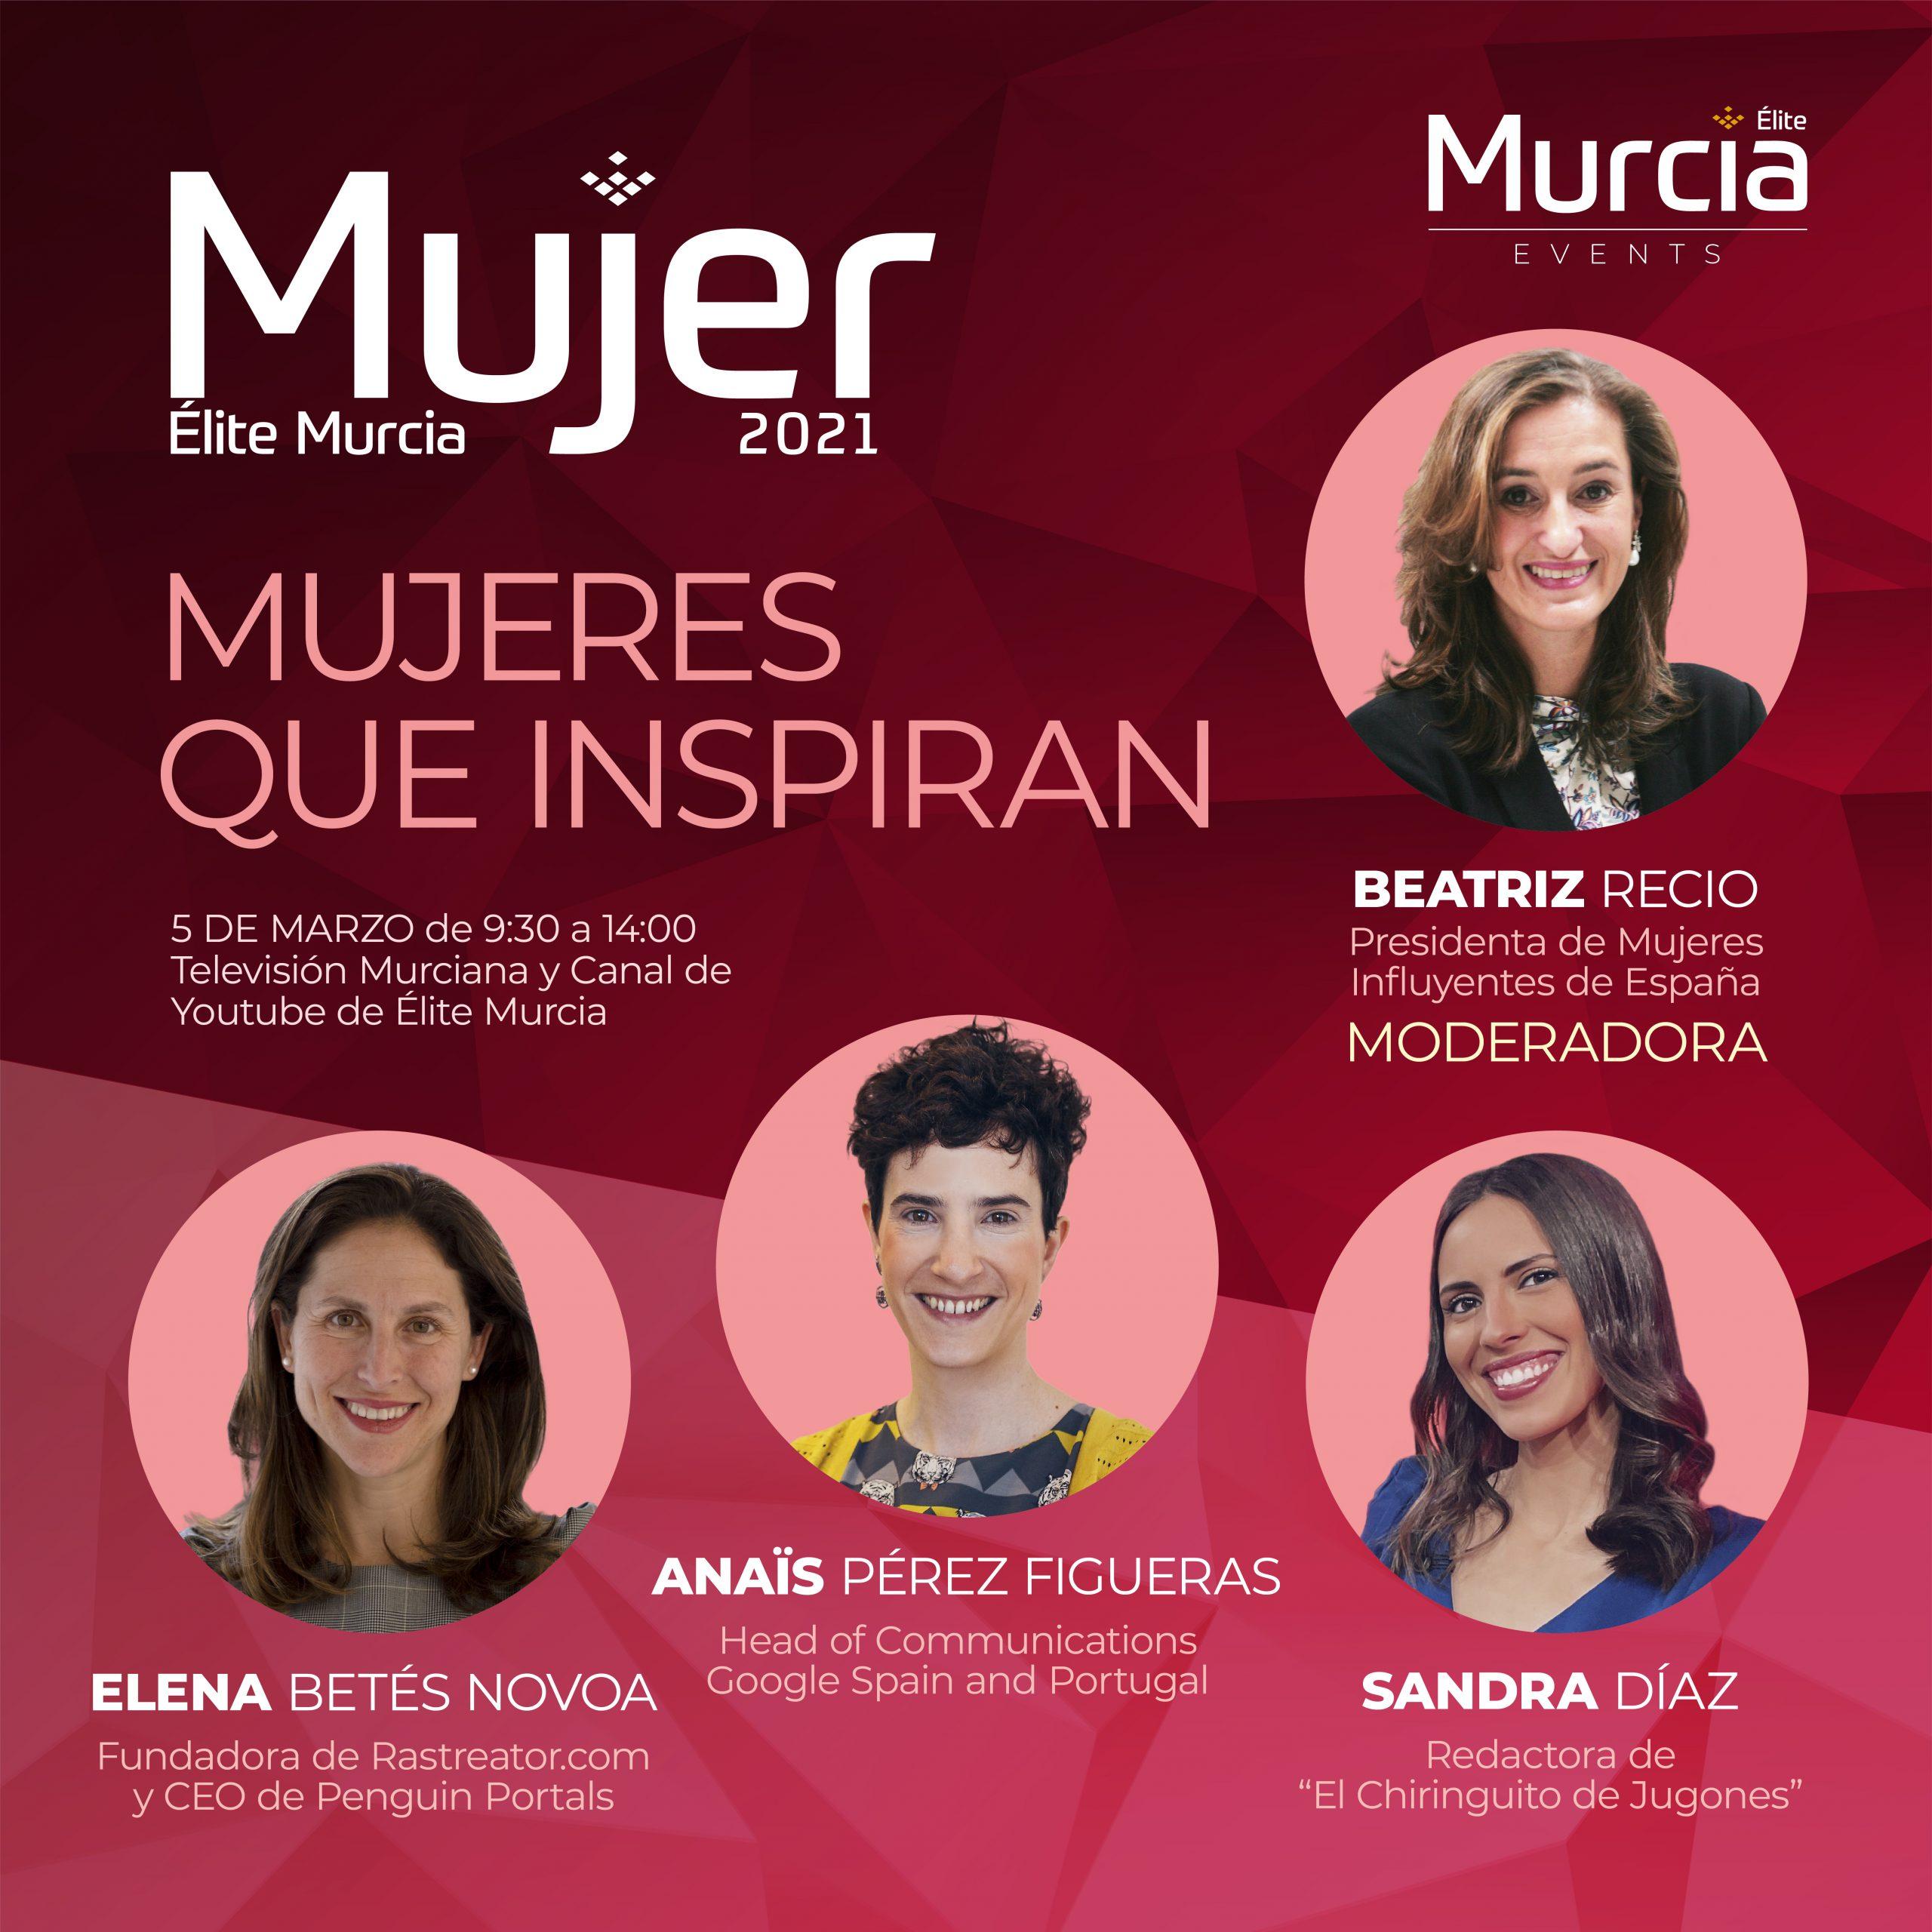 MujerEliteMurcia